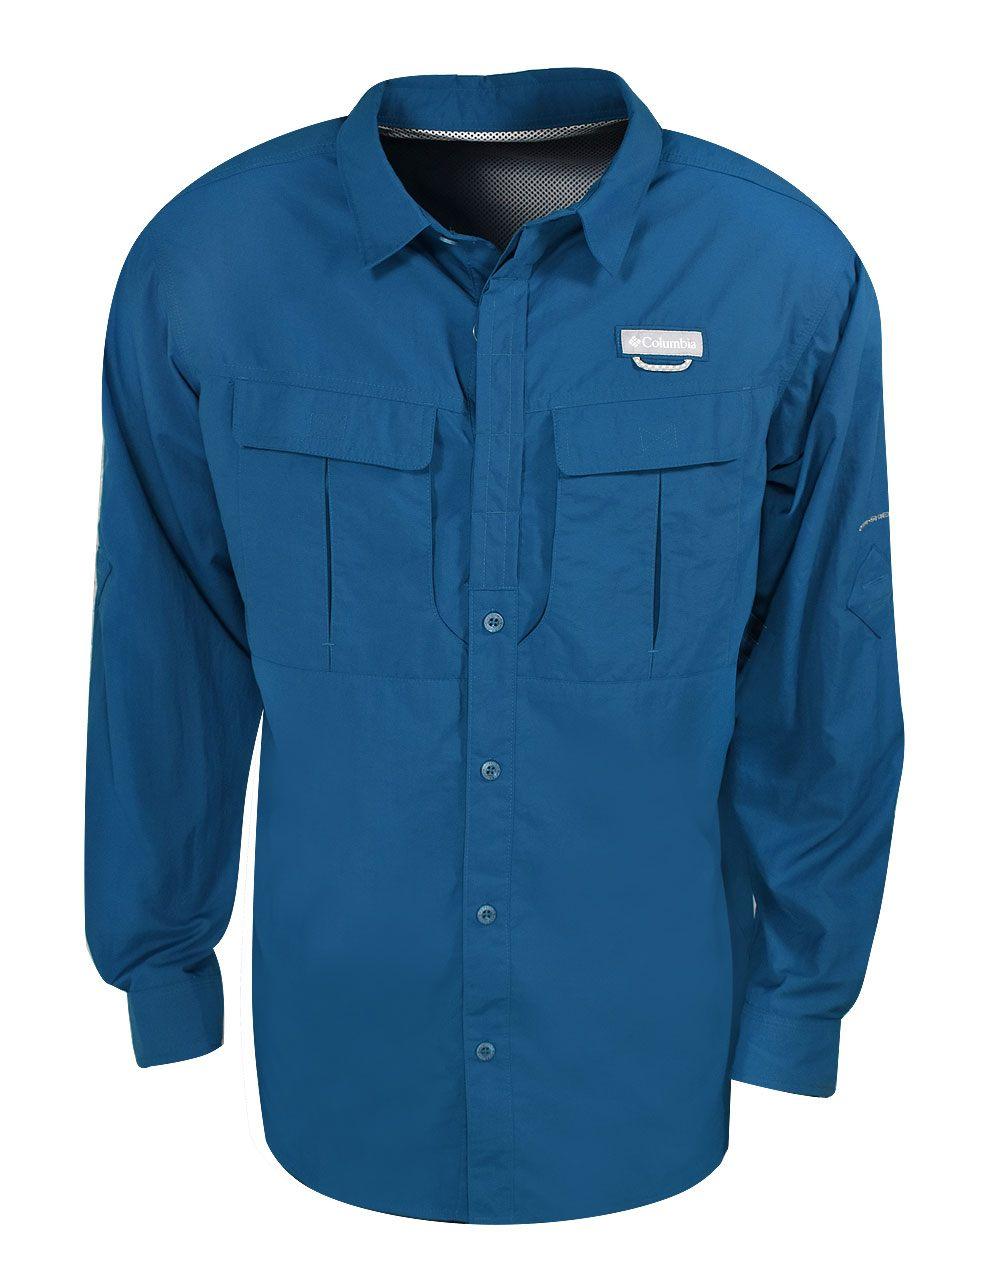 Columbia Long Sleeve Shirts Clearance  0e80fc72a